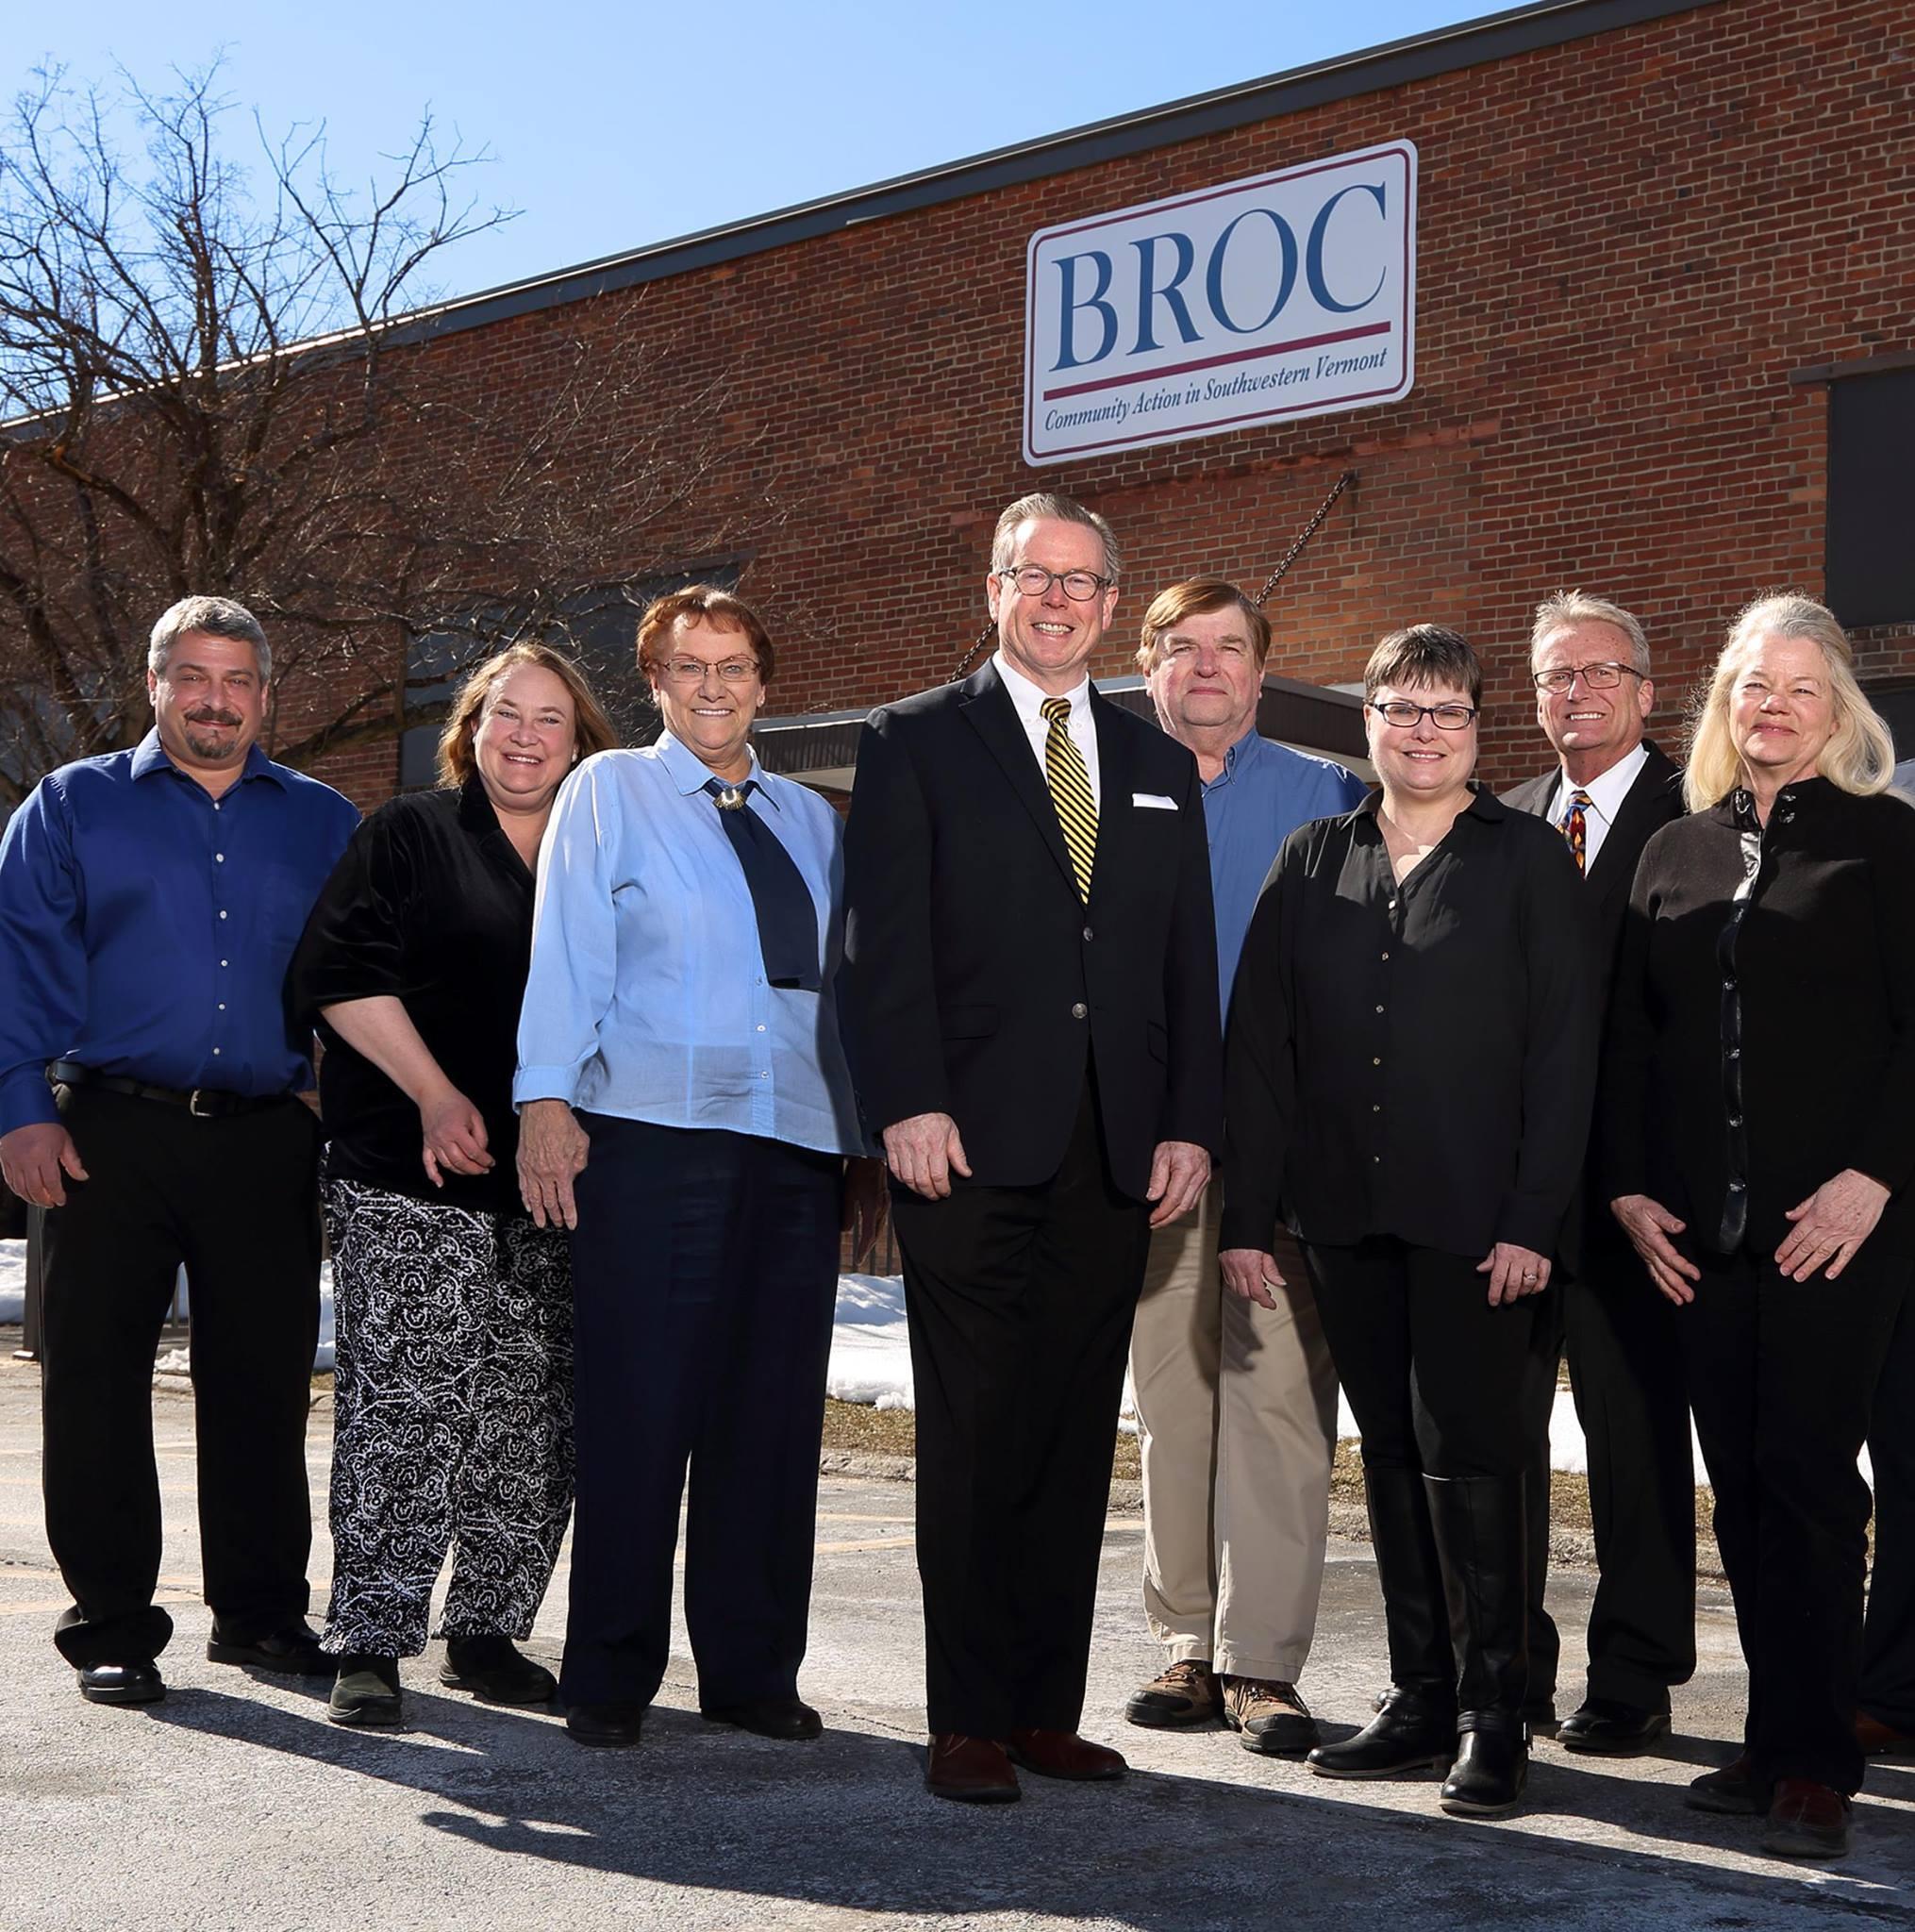 BROC-Community Action in Southwestern Vermont Food Shelf